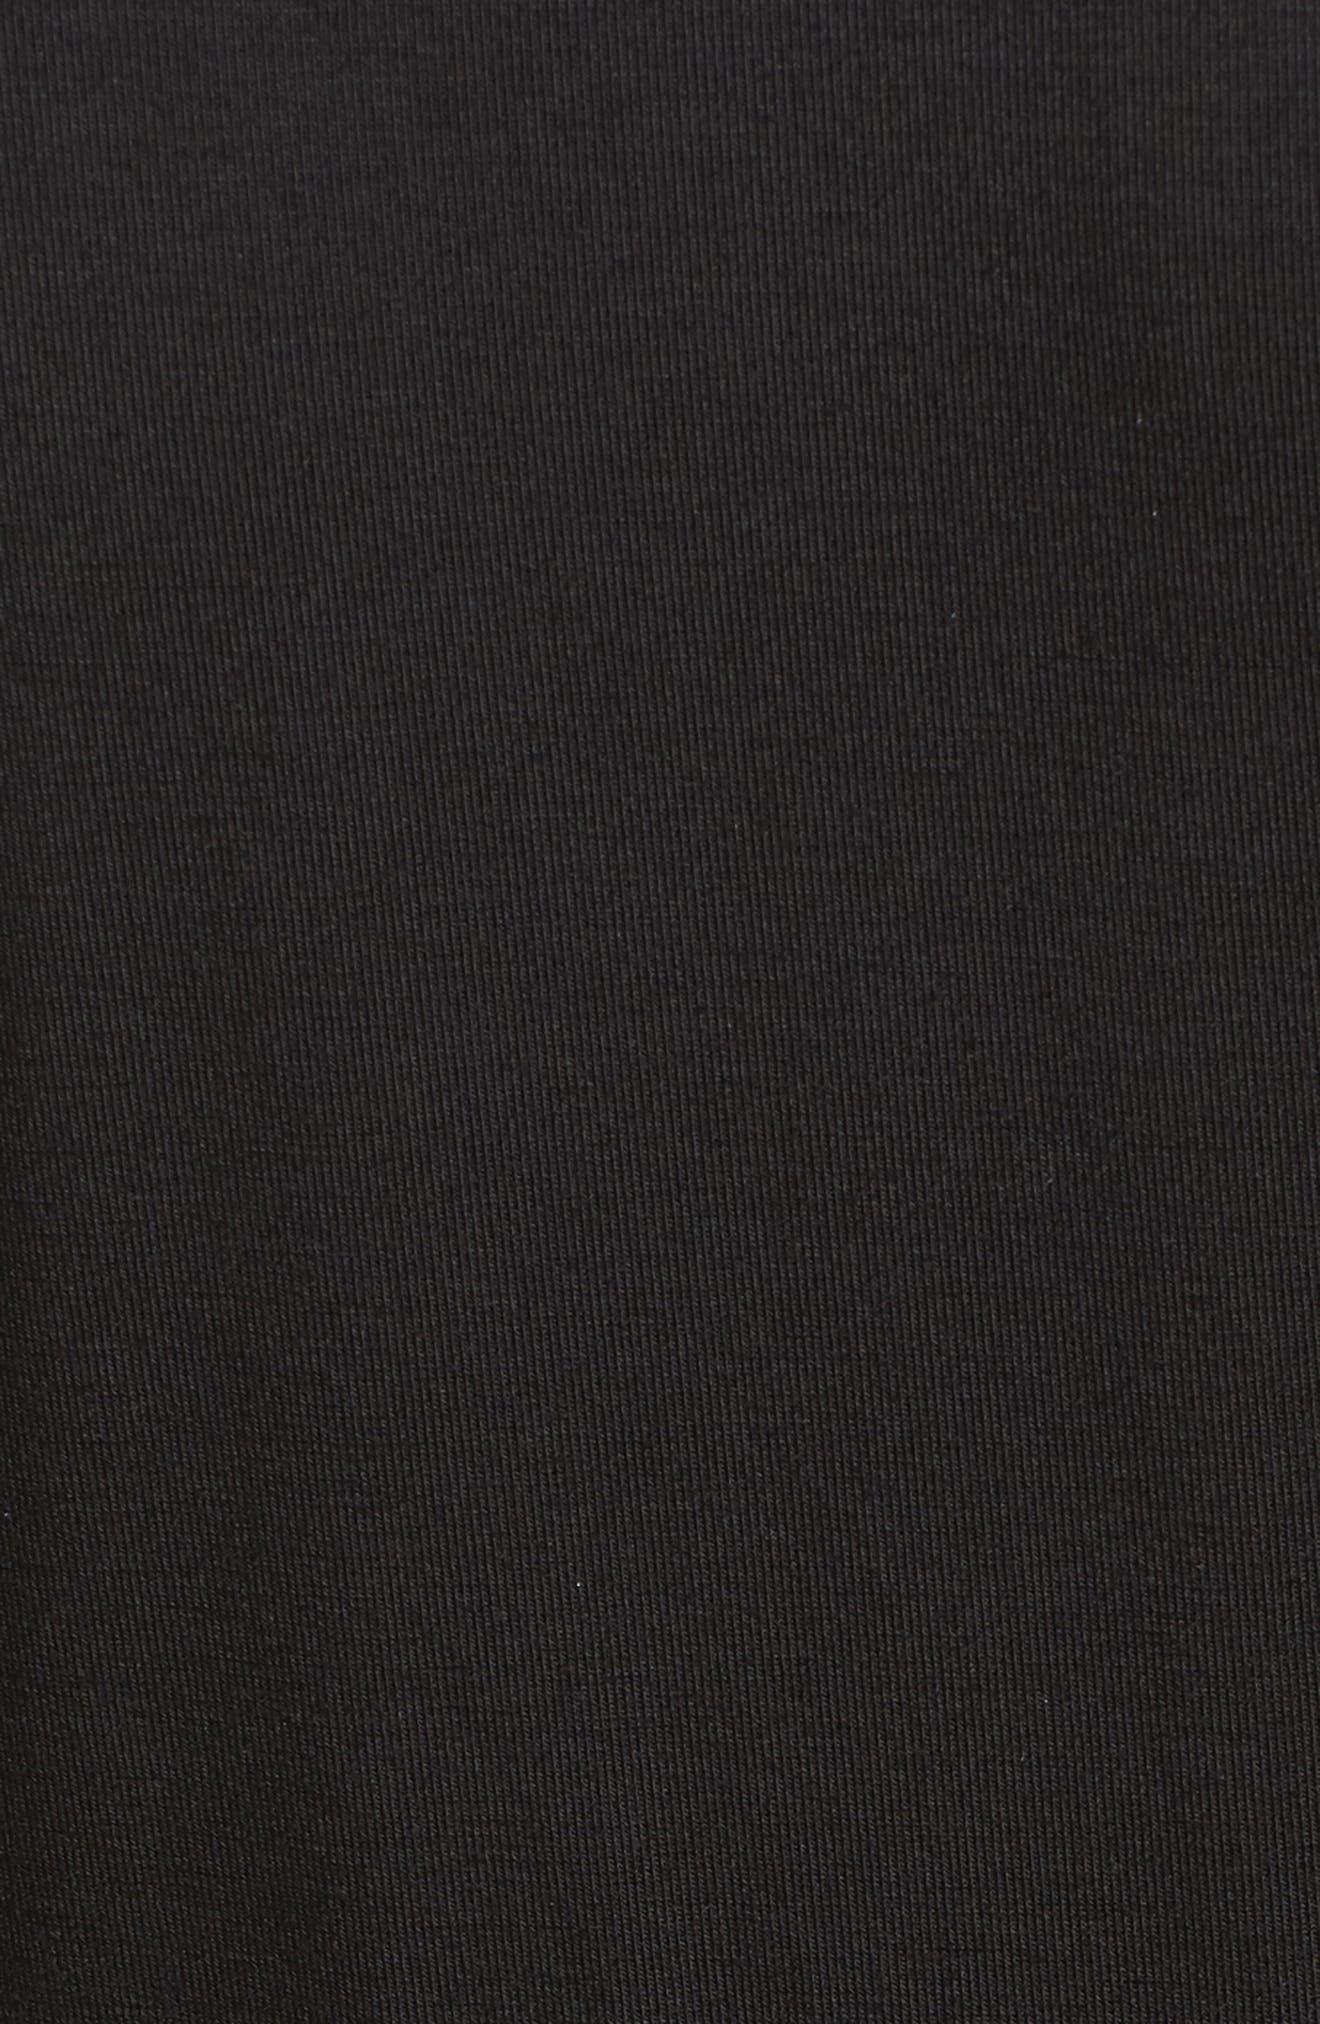 Ruffle Wrap Dress,                             Alternate thumbnail 5, color,                             003